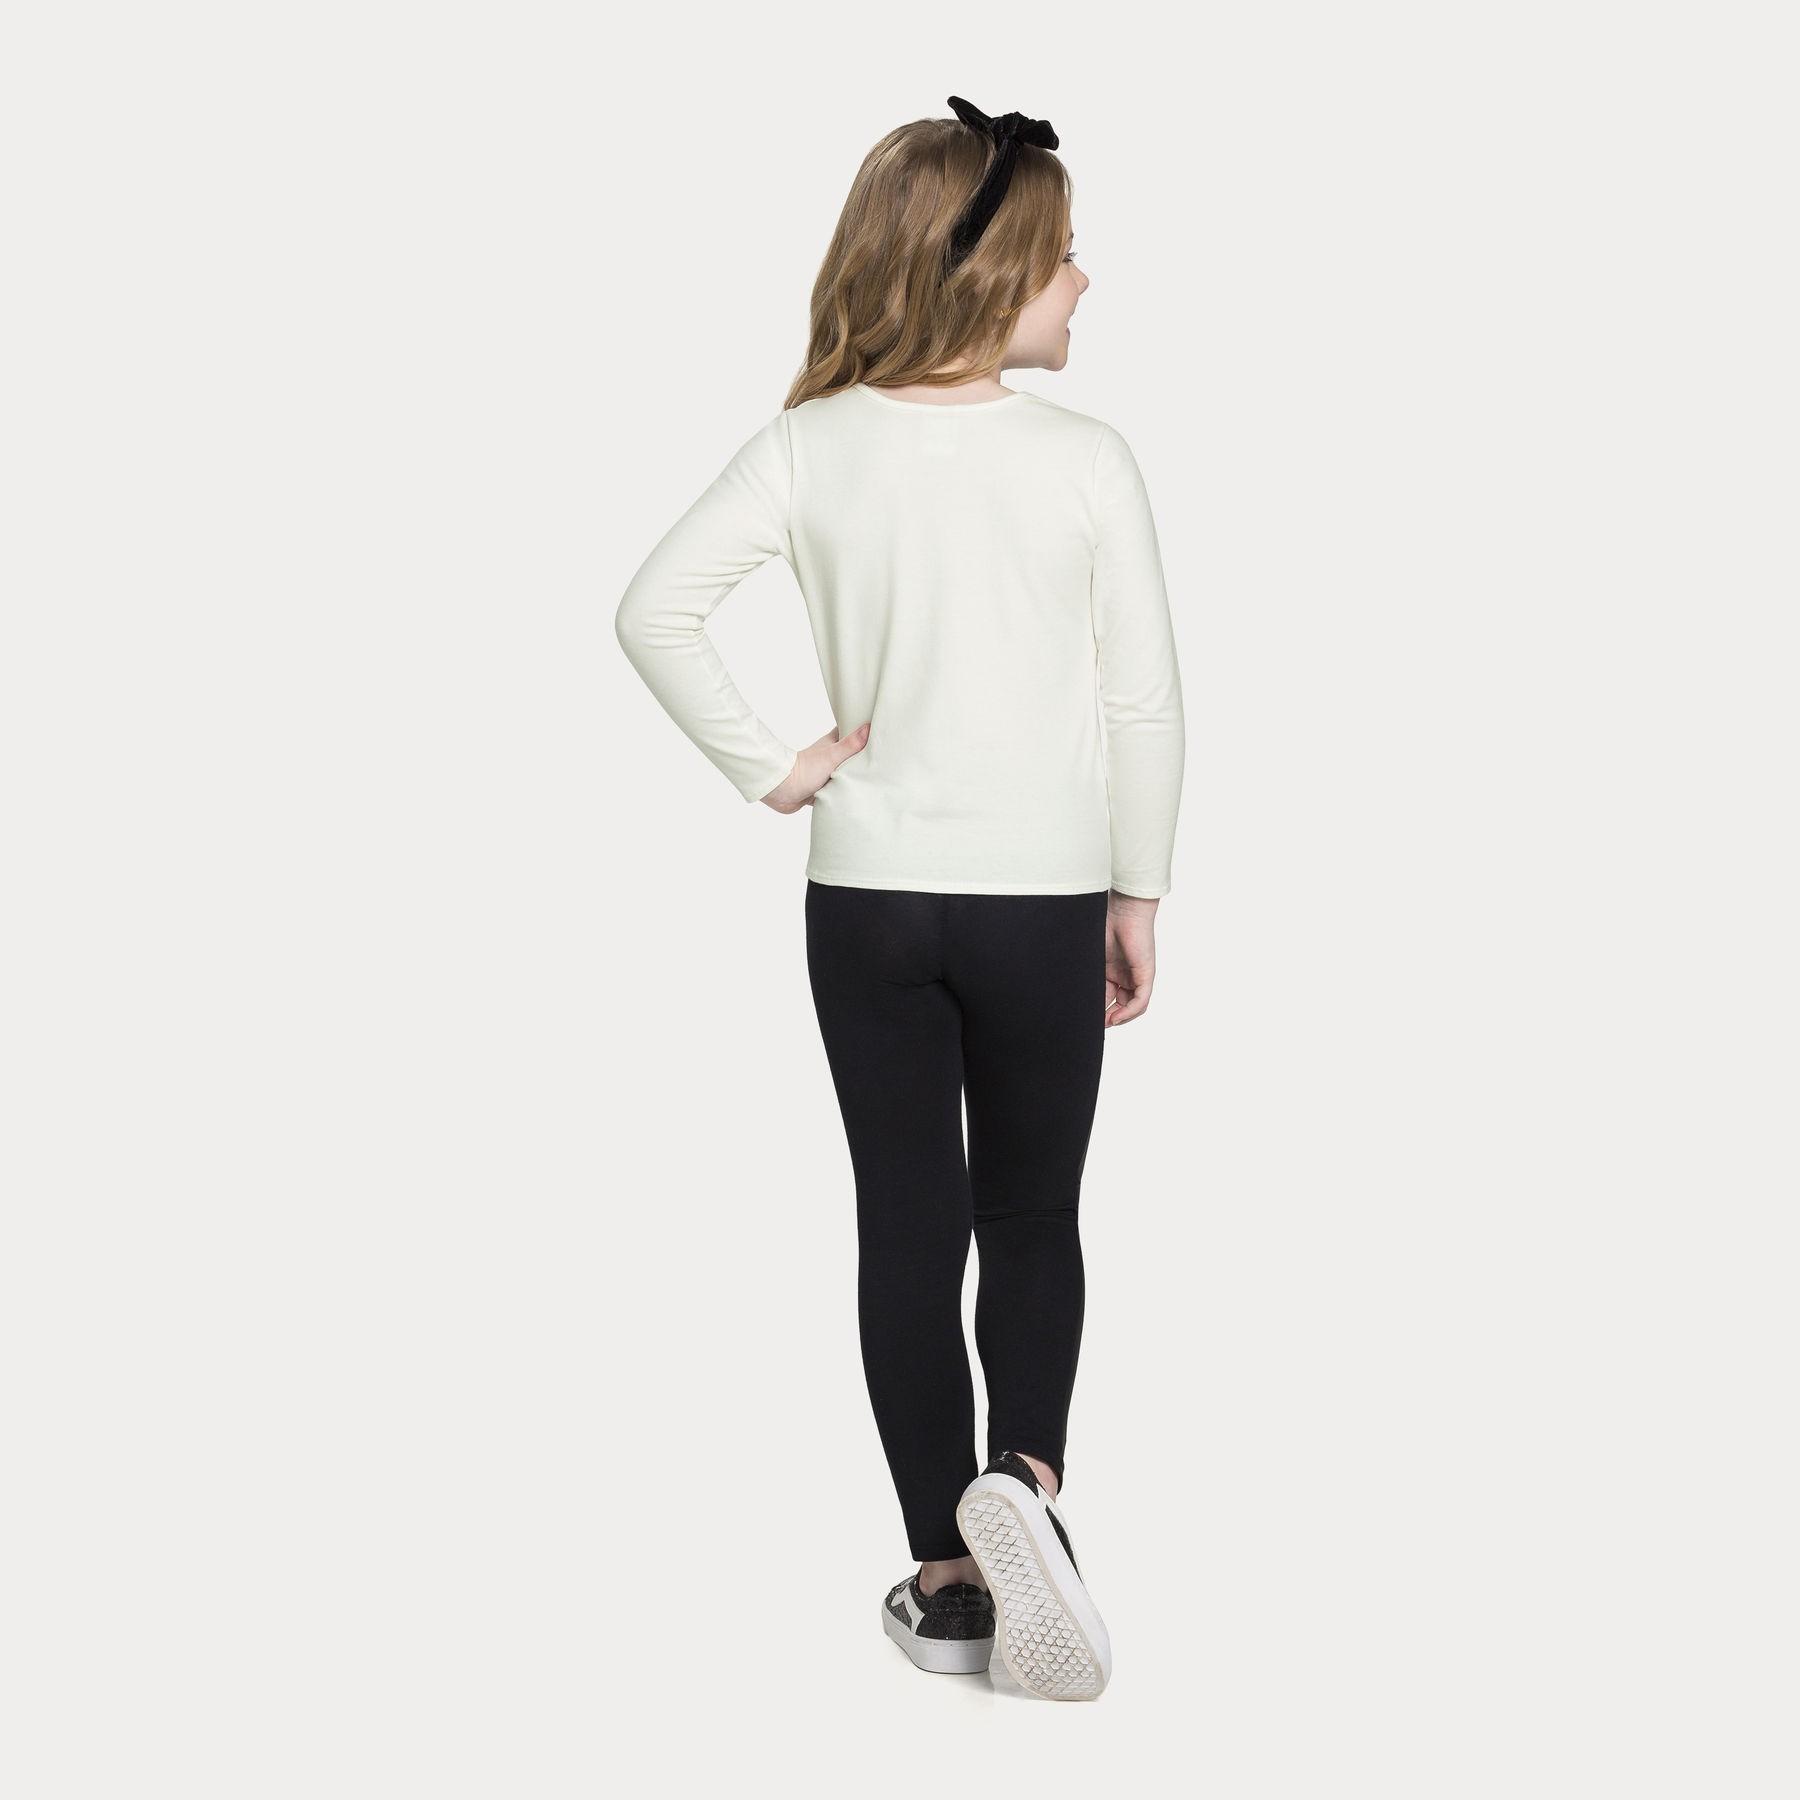 Conjunto Malha Cotton Soft, Malha Cirrê e Skinny Cotton Branco Off White